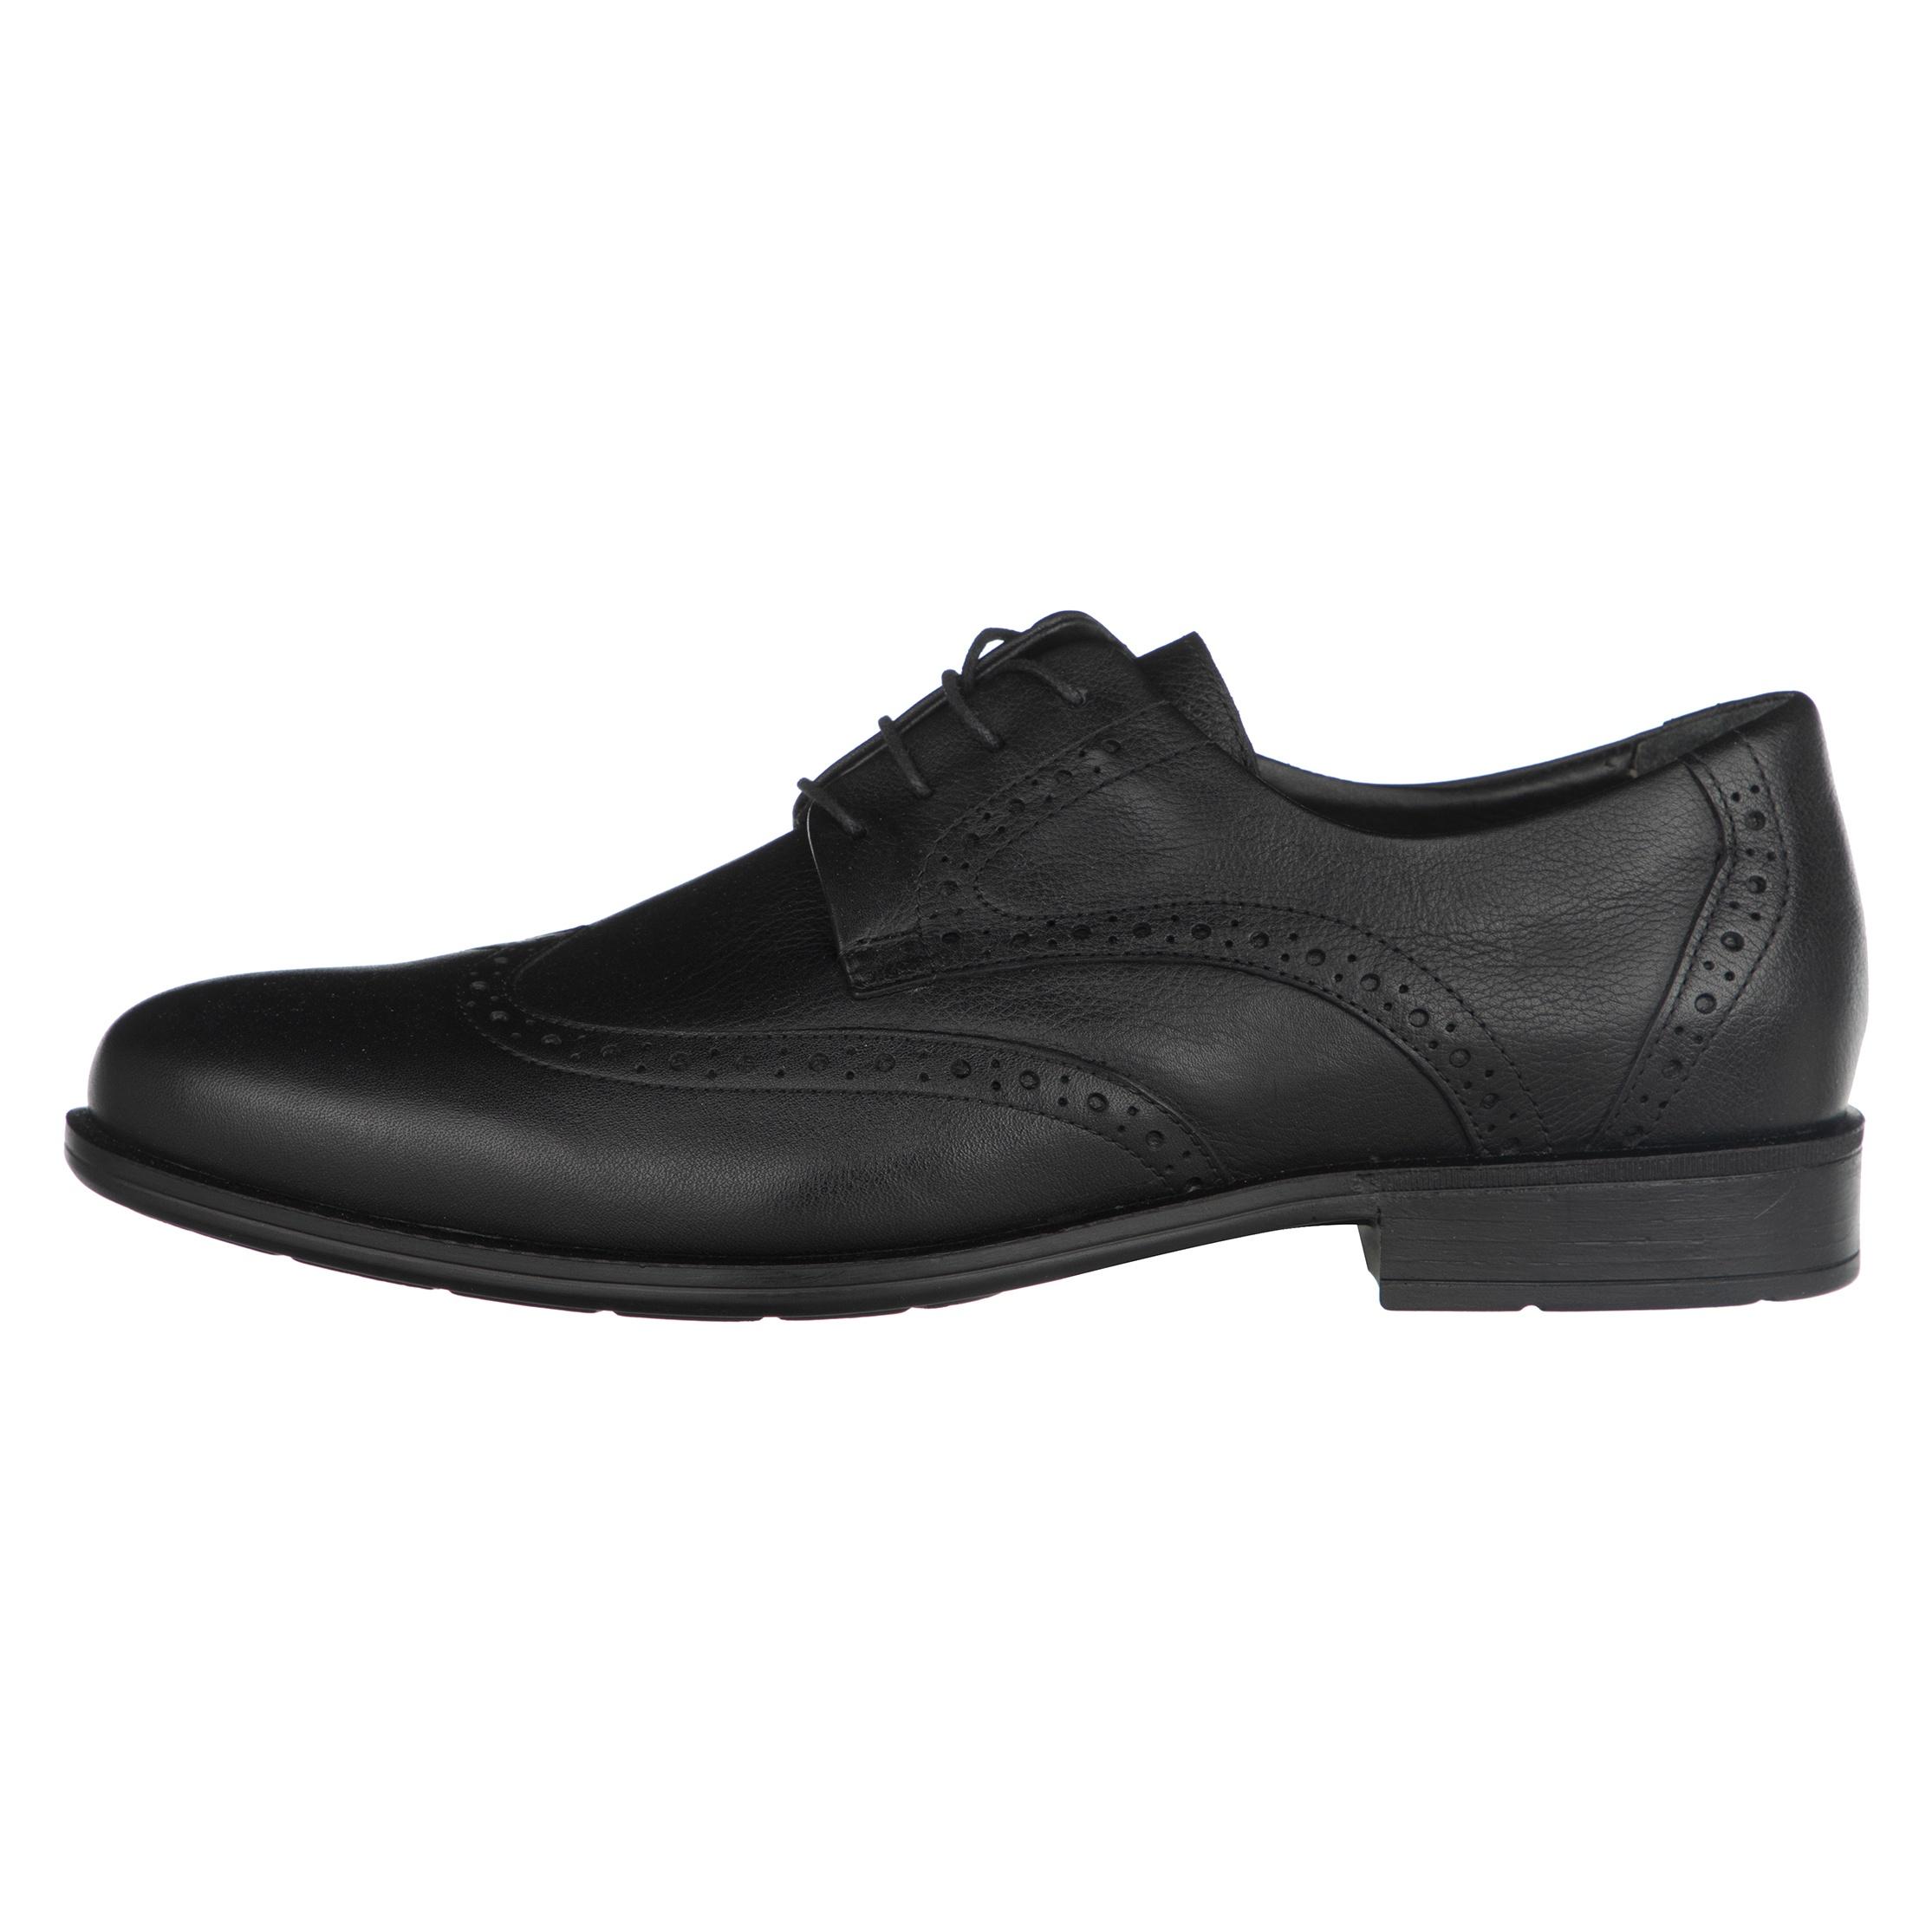 کفش مردانه پولاریس مدل 100297123-101